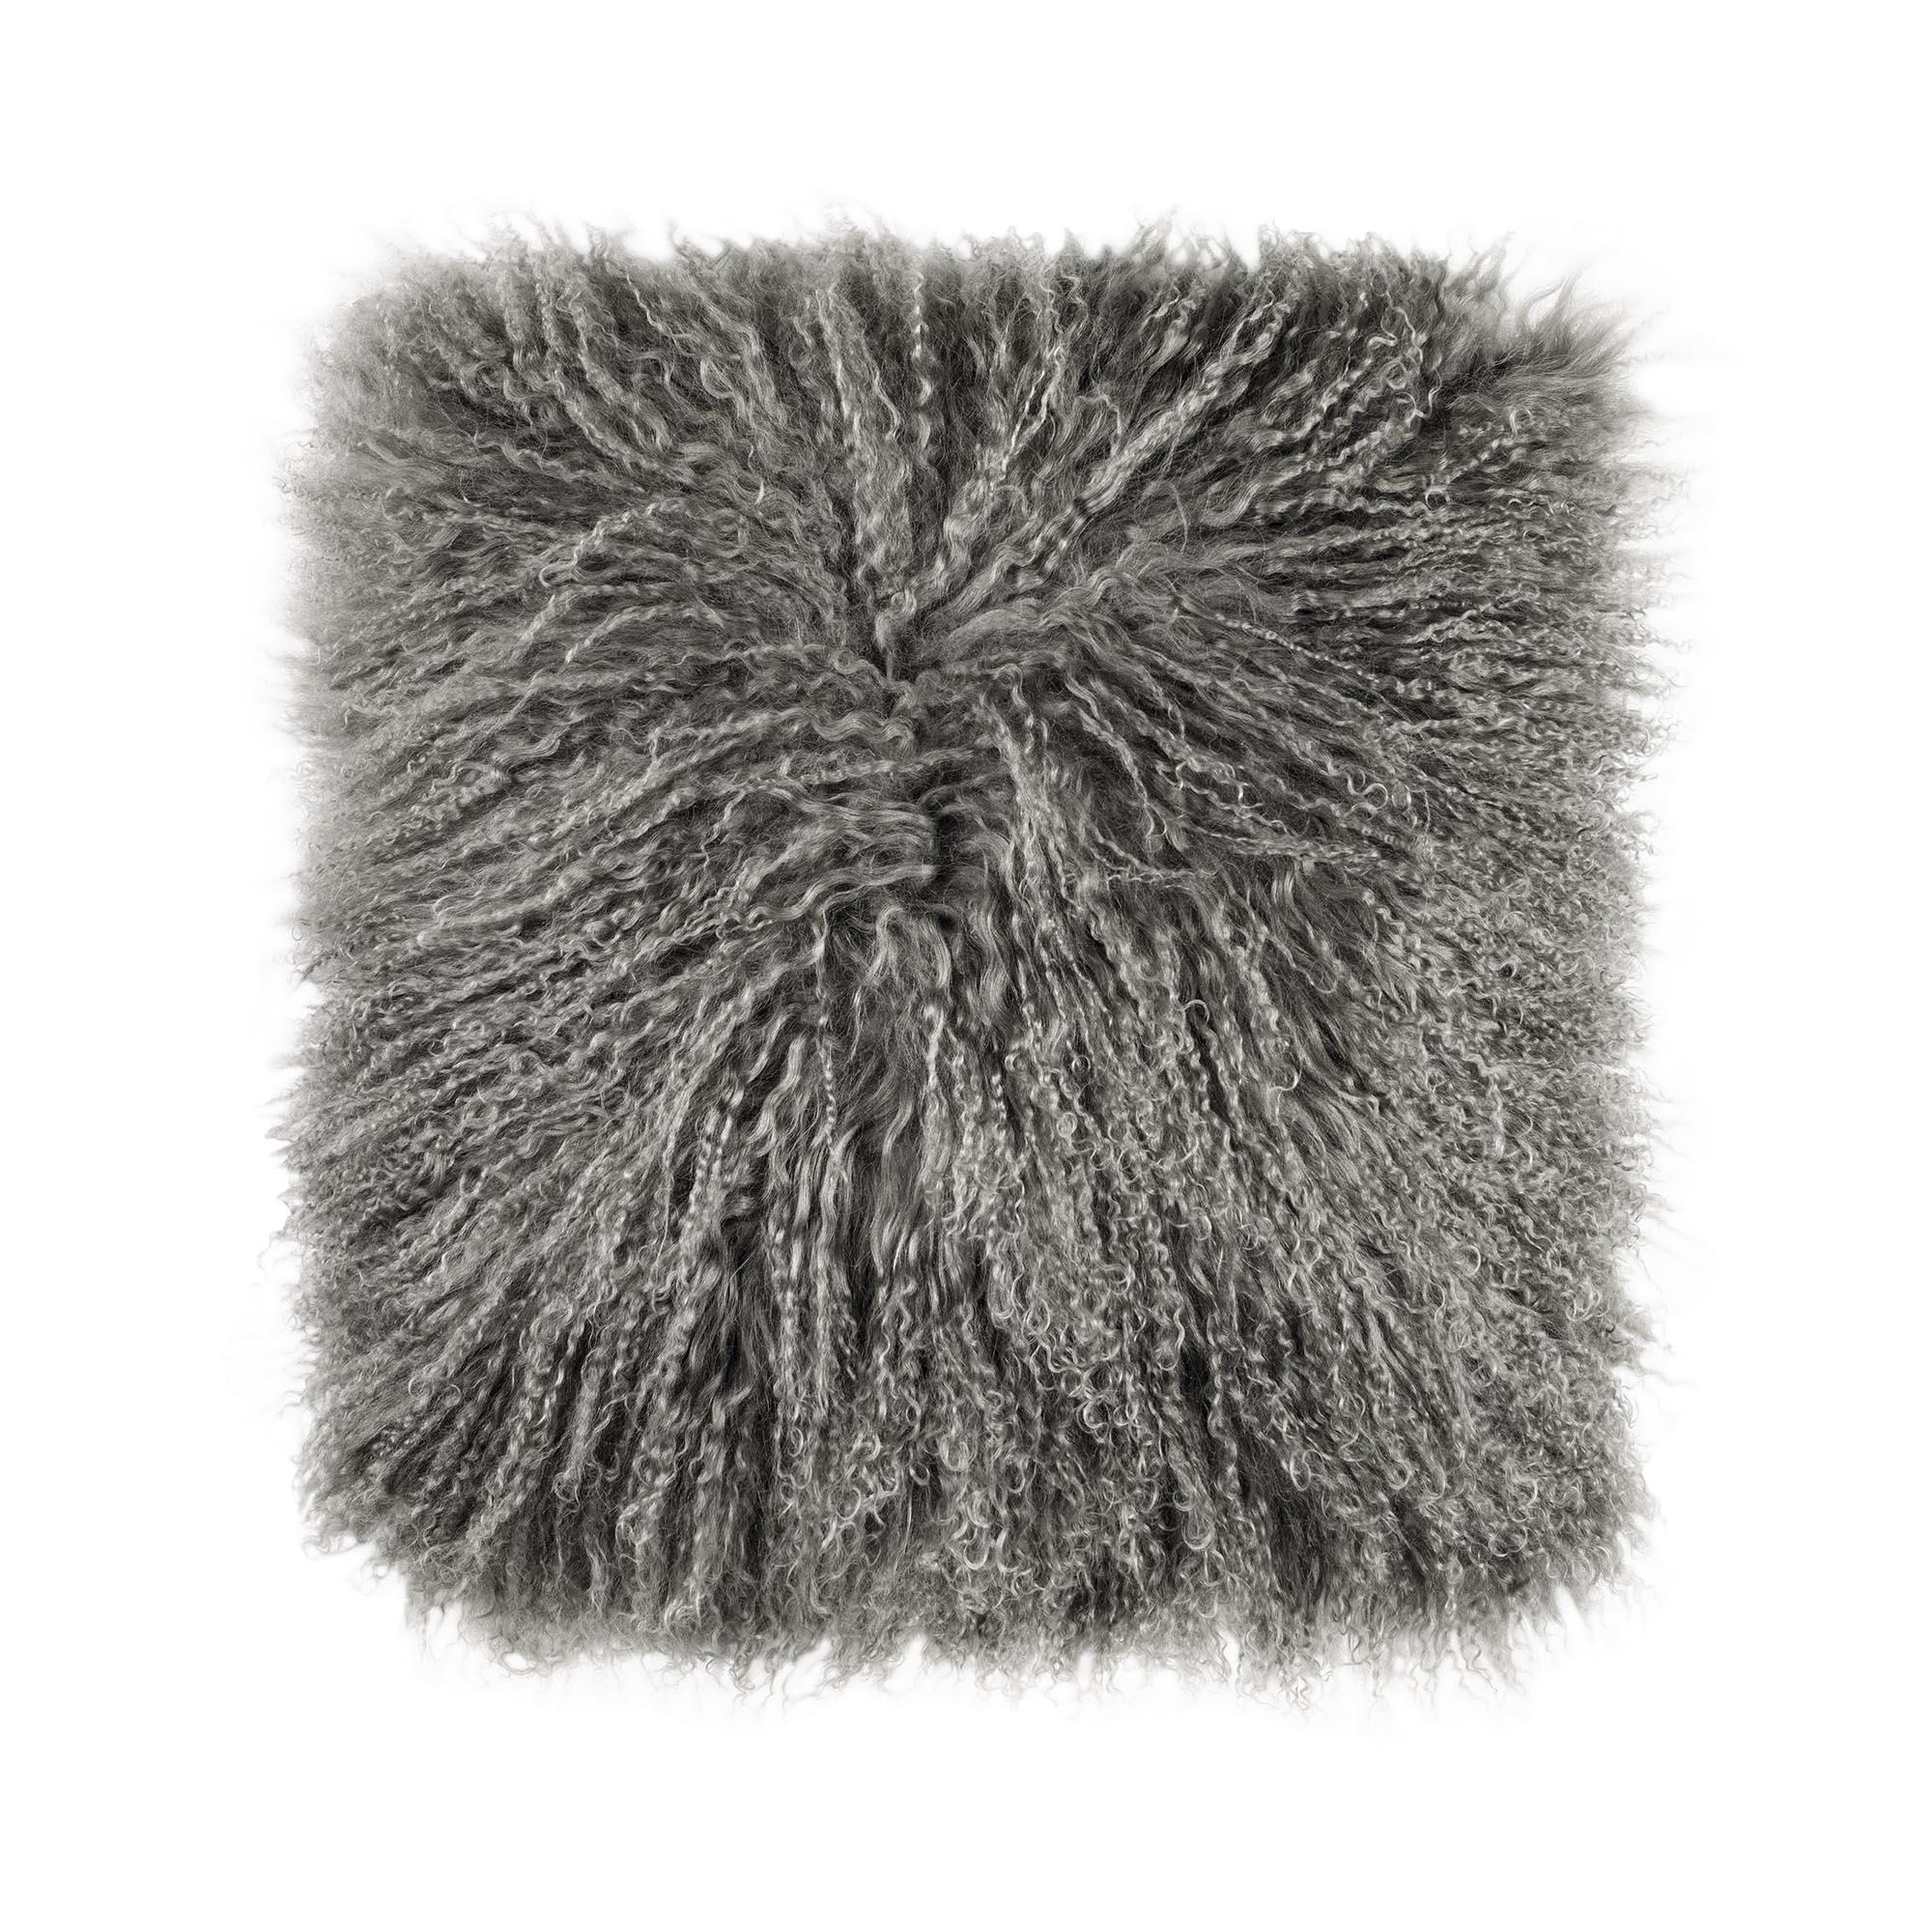 Декоративные подушки Togas Декоративная подушка Нордик Цвет: Серый (40х40) подушки декоративные togas декоративная подушка